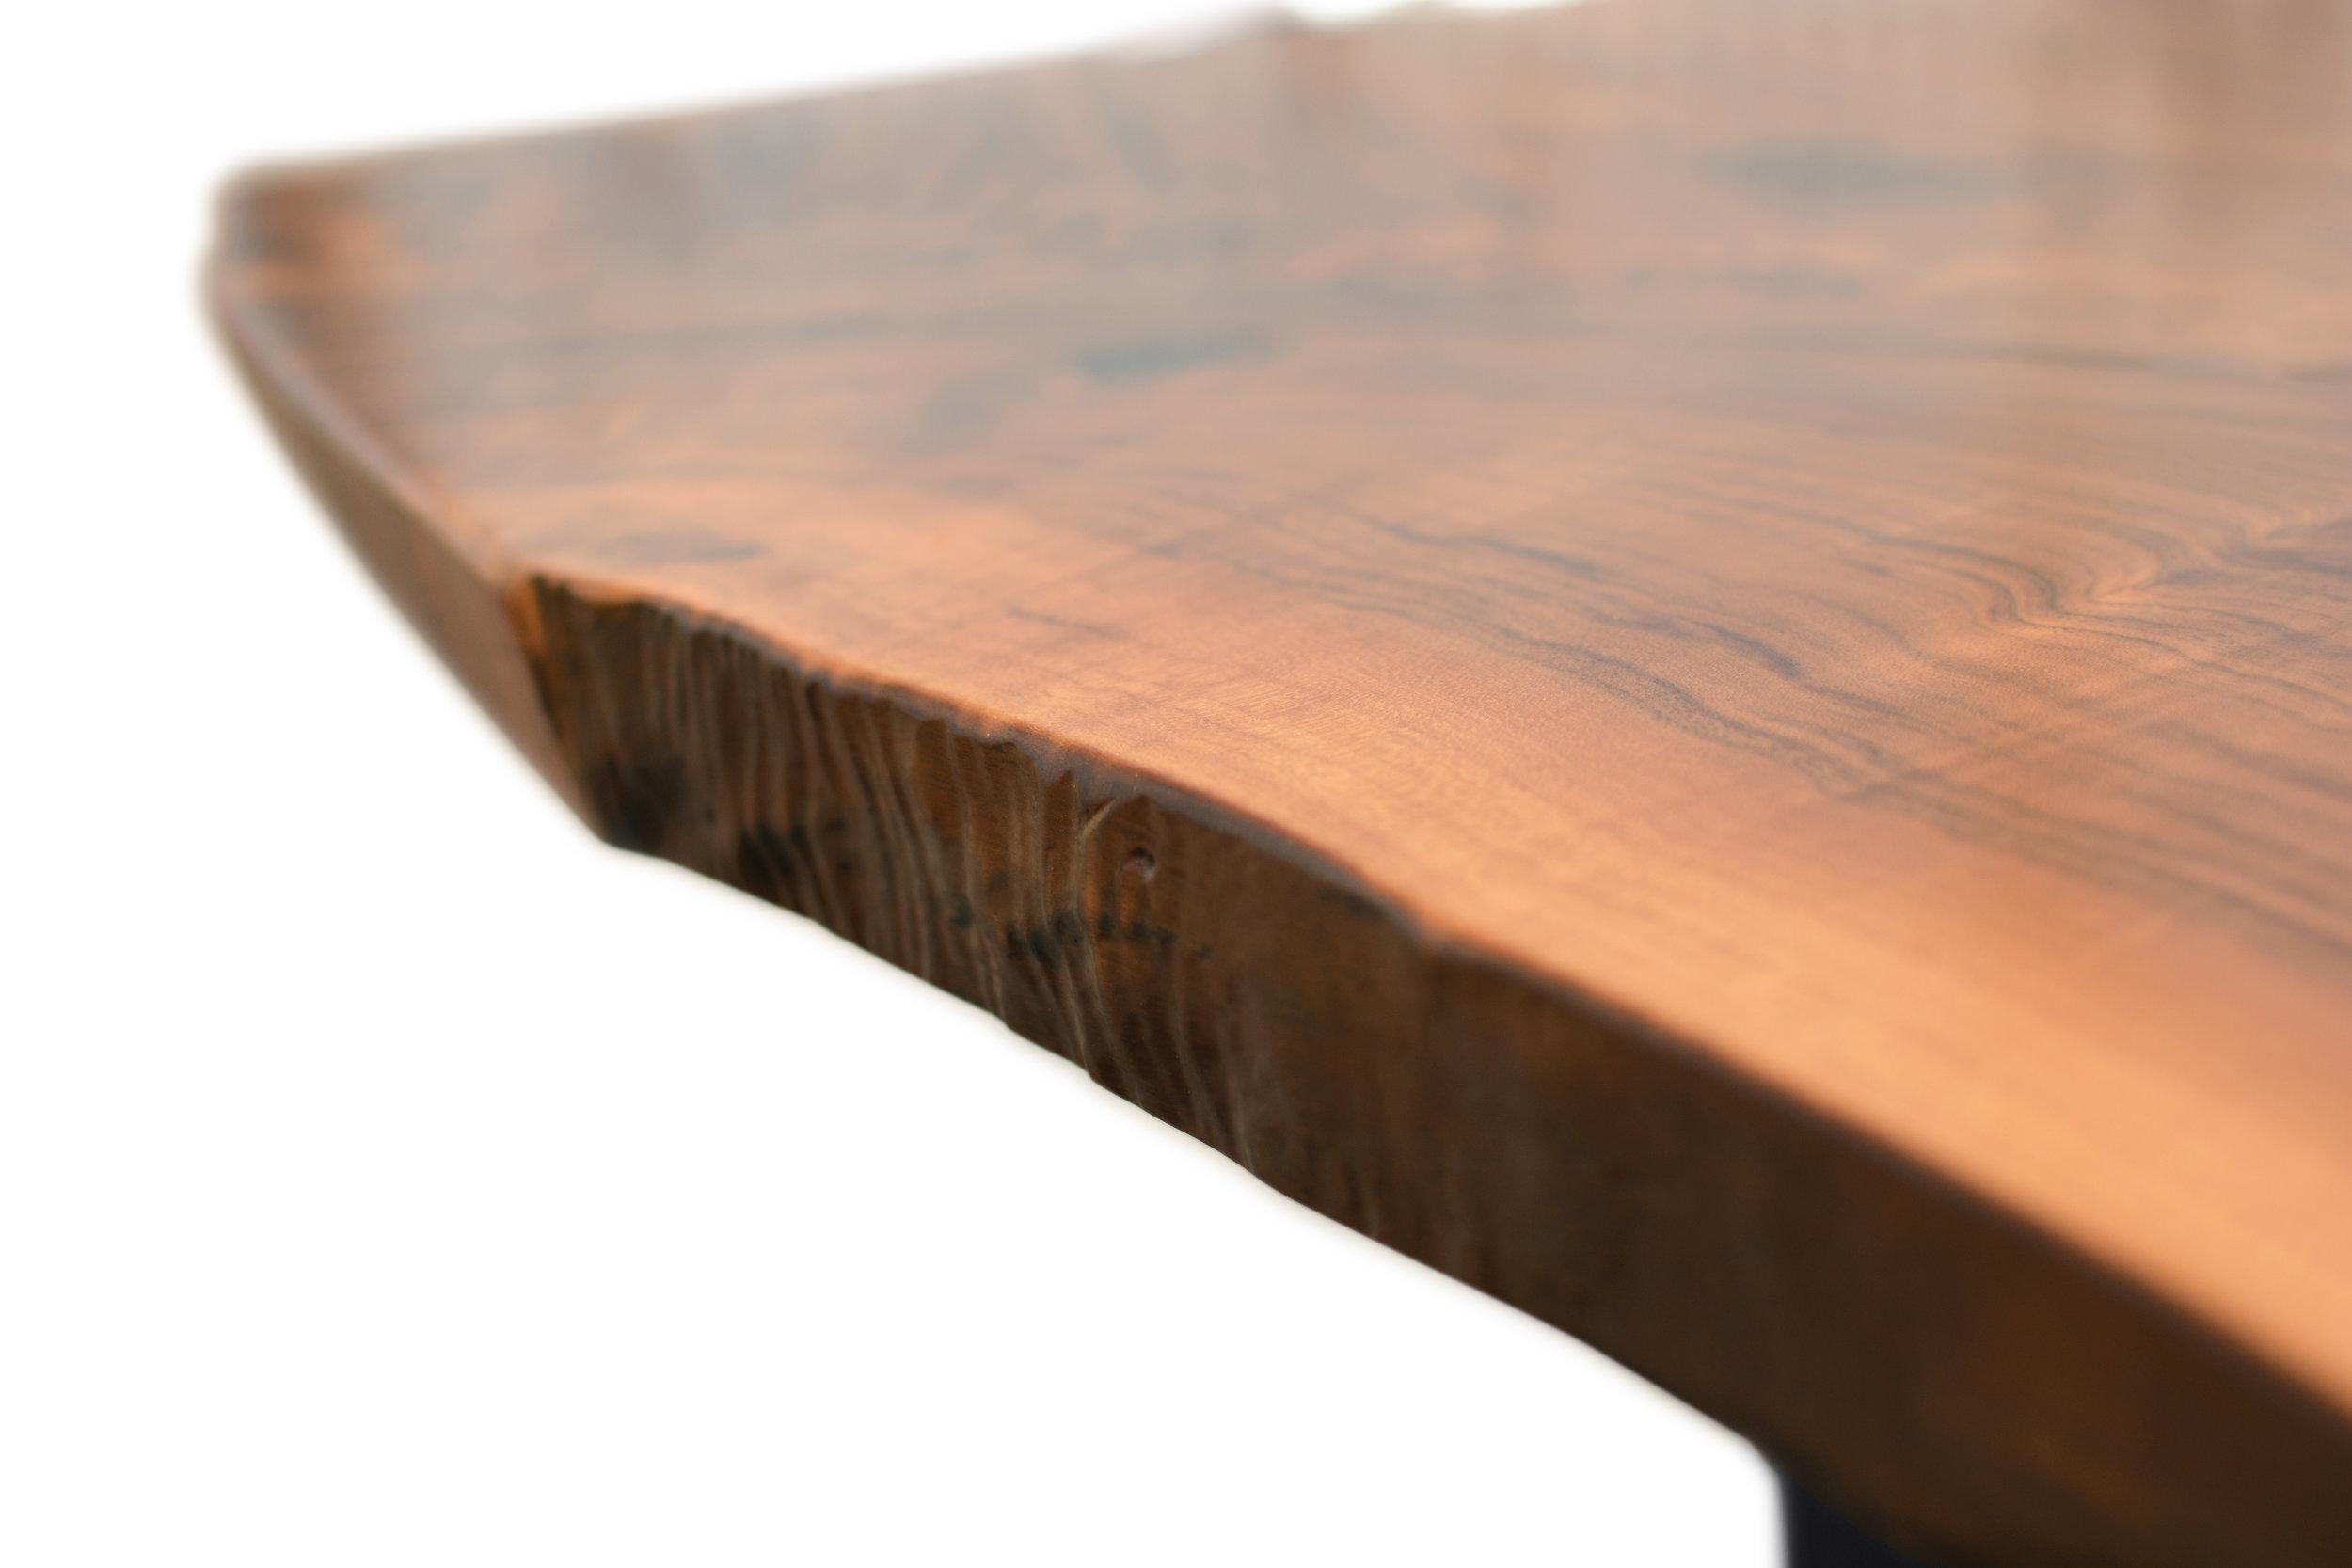 Etz & Steel Hermes Live Edge Walnut Table Close Up 21.JPG